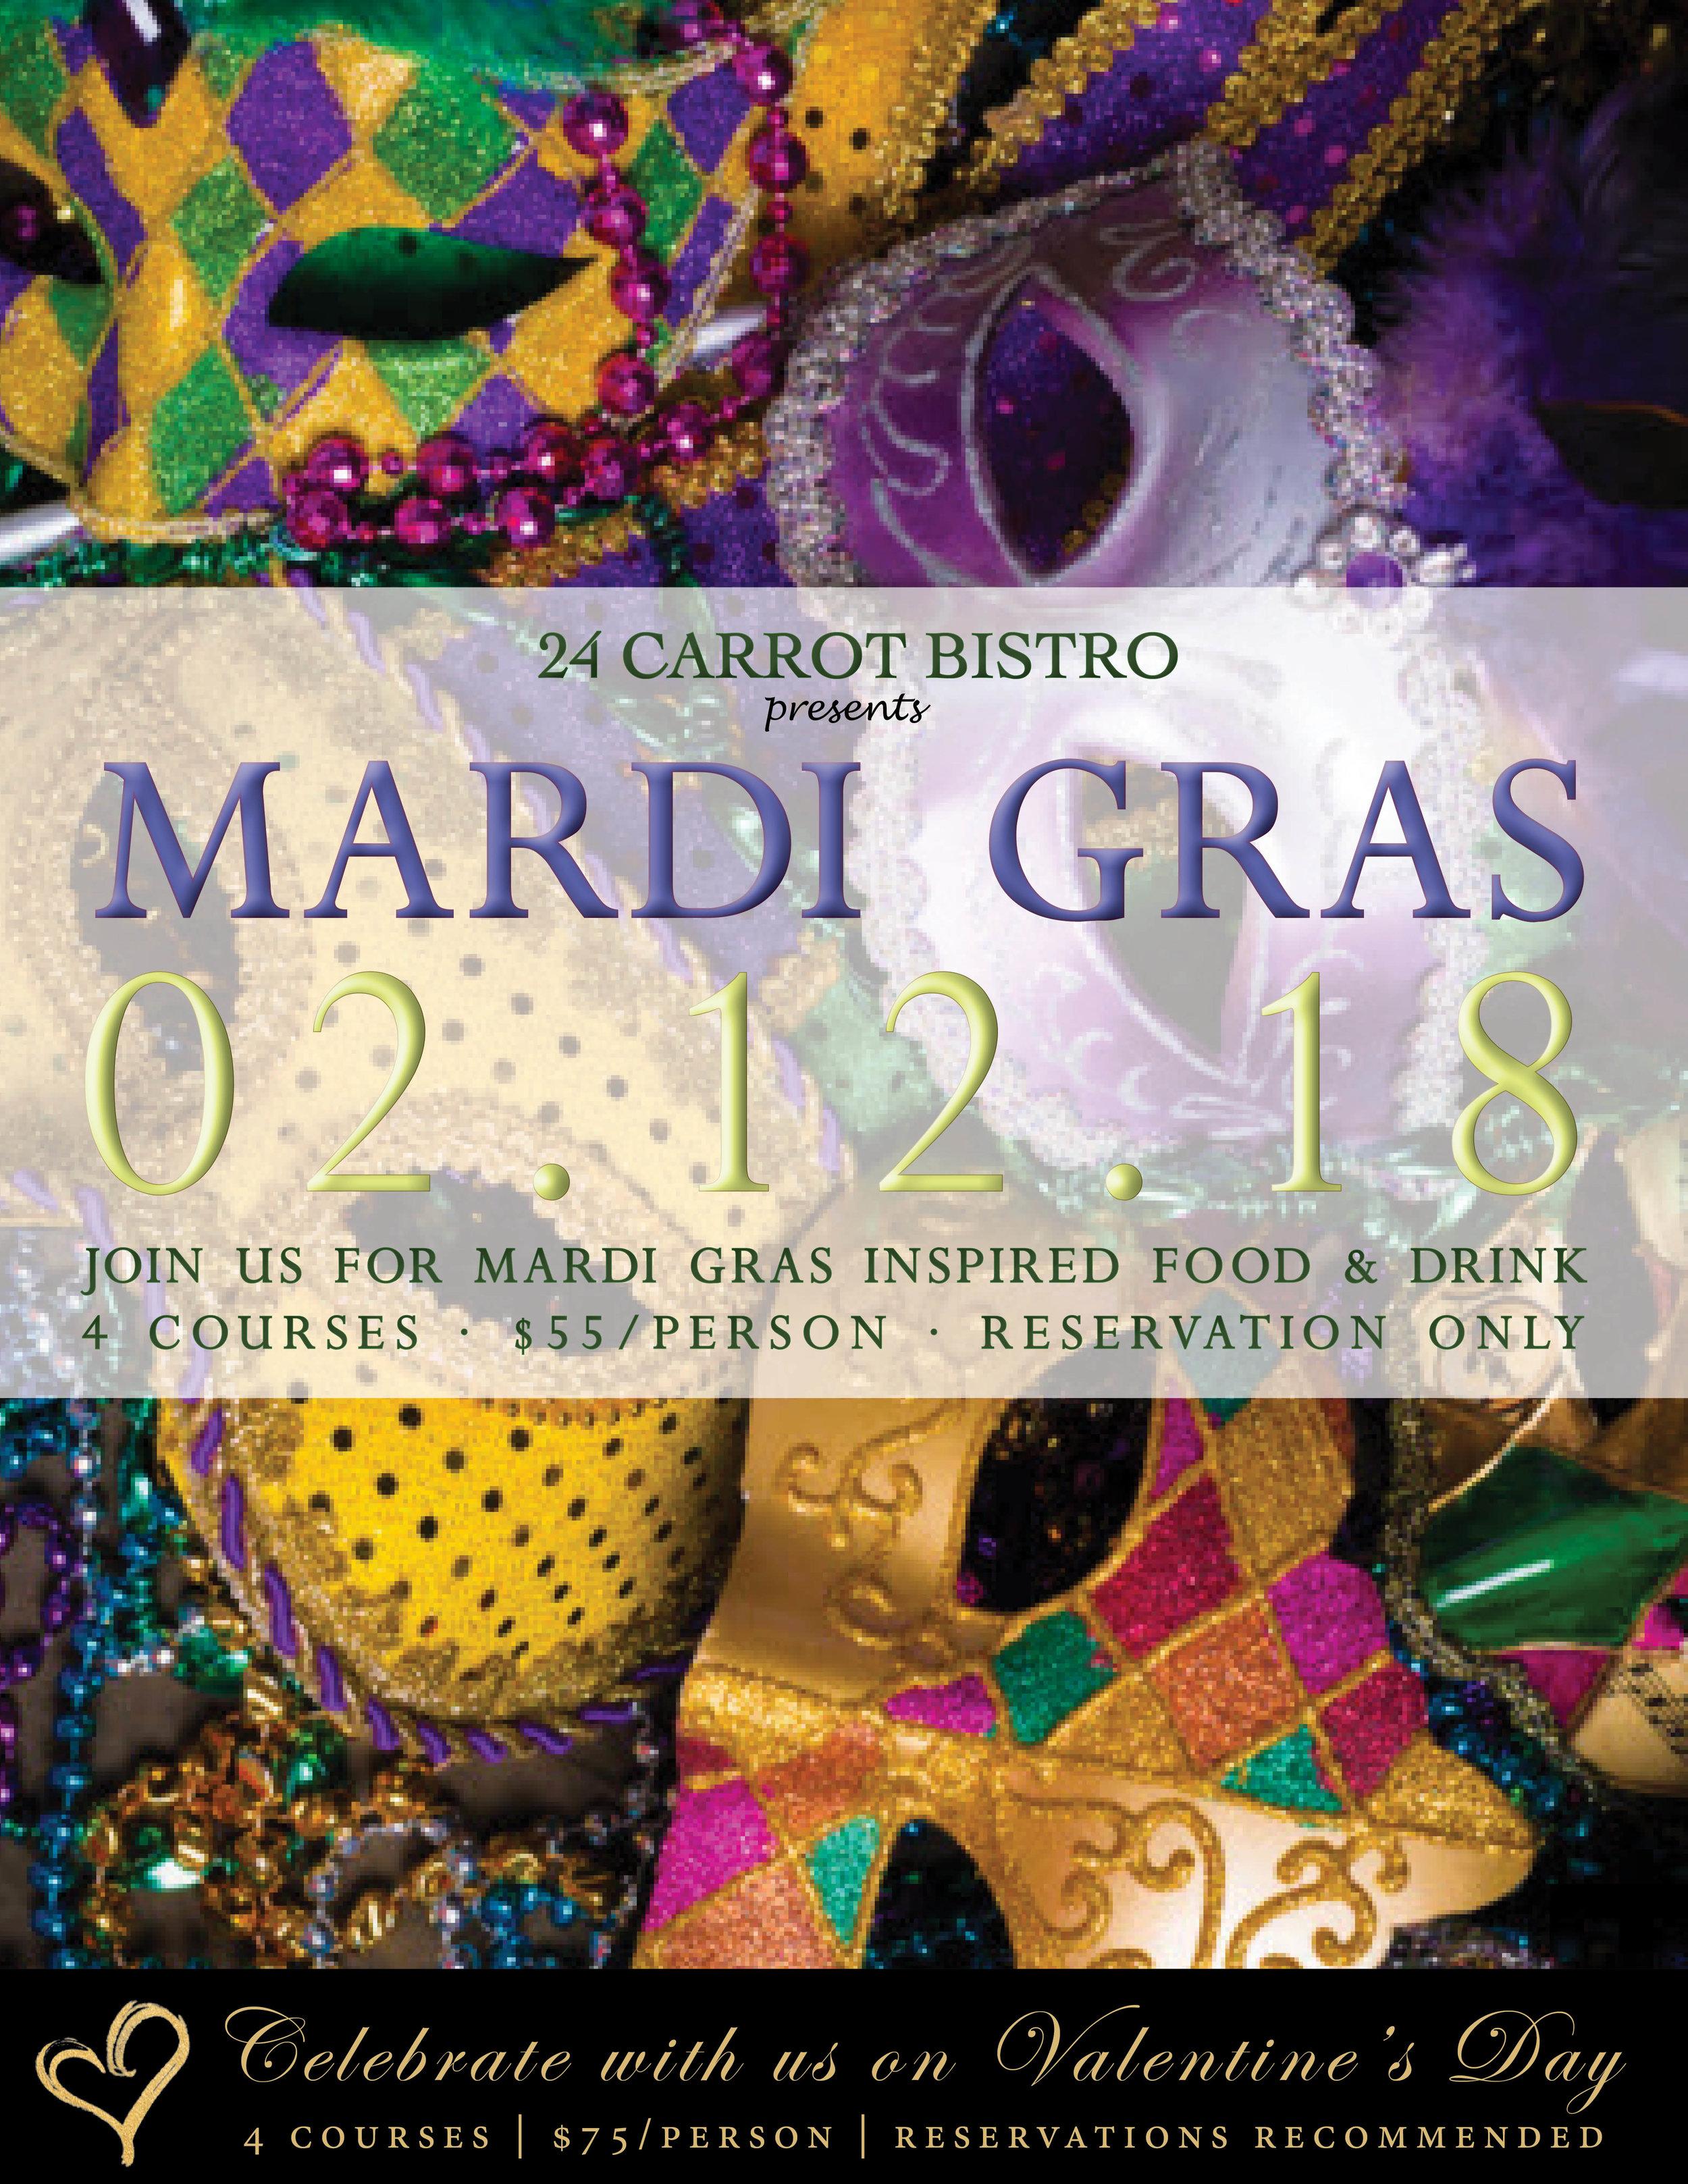 Mardi Gras 2018 Poster.jpg